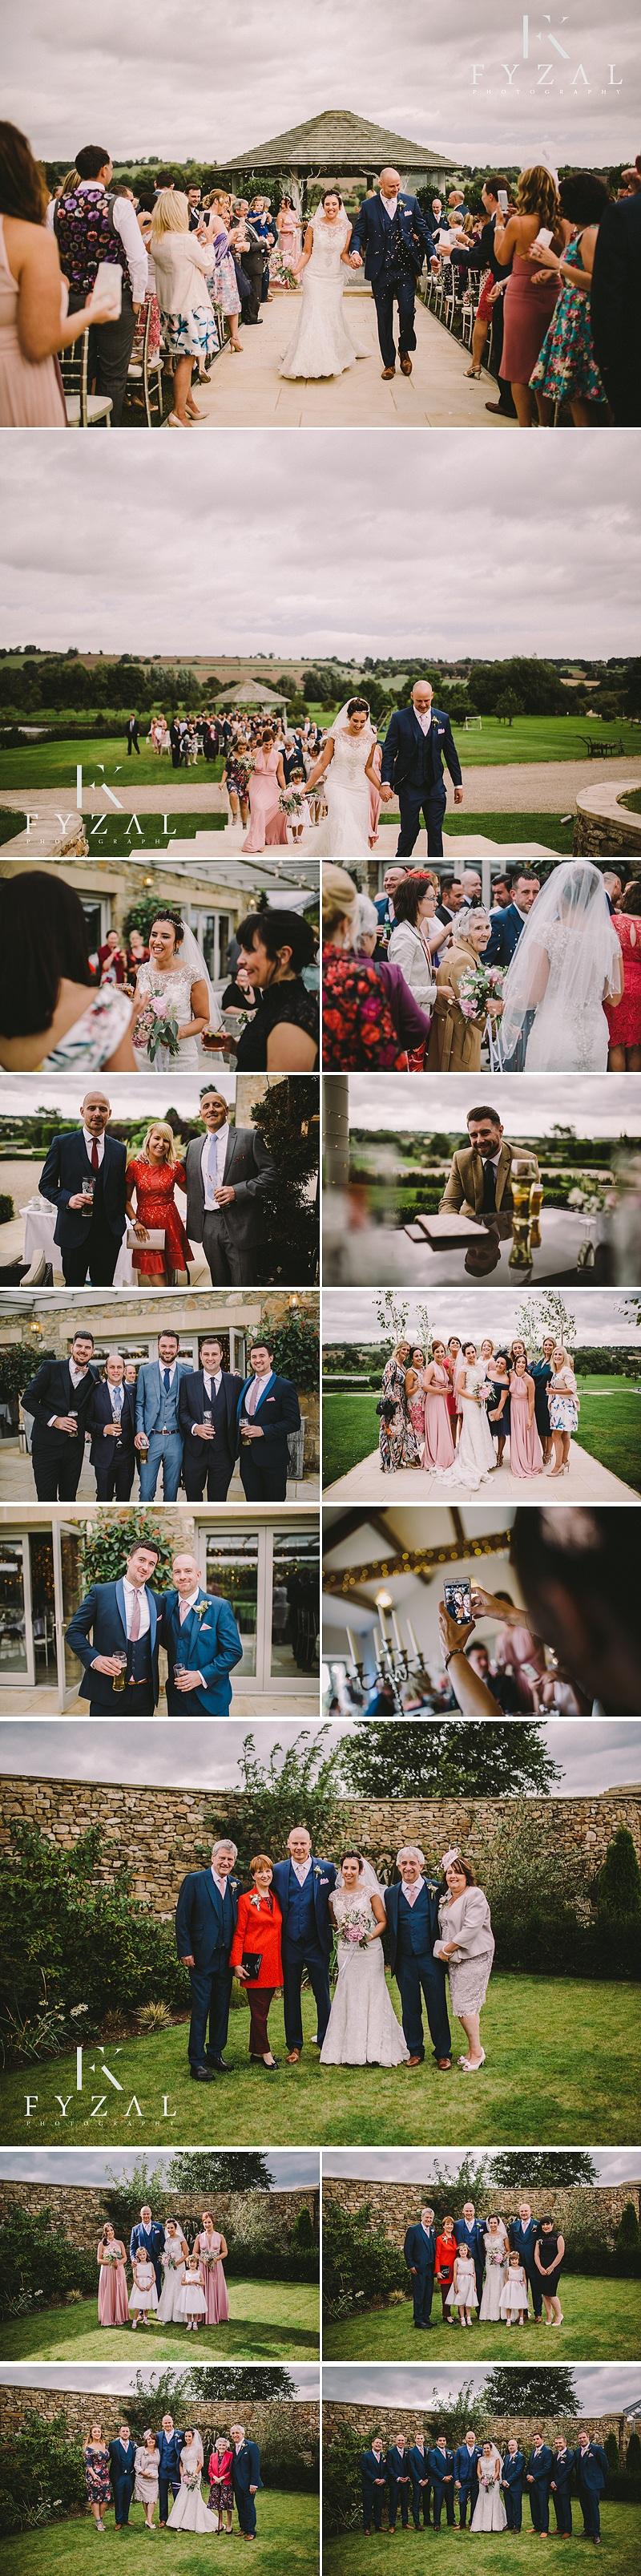 160924-Stacey-Tom-Wedding-06.jpg